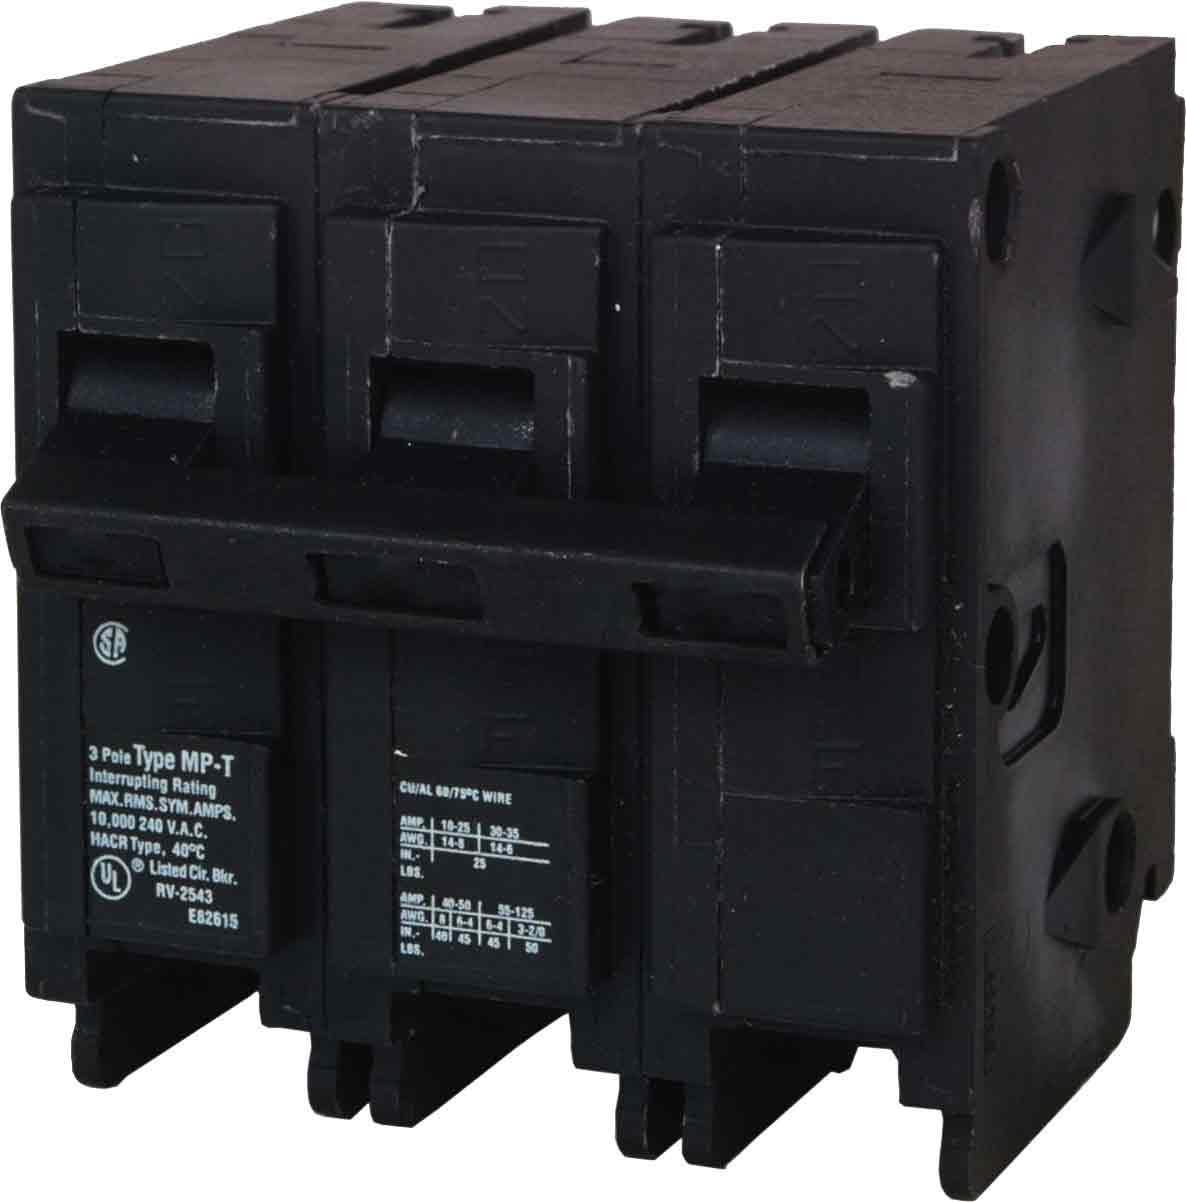 MP330 30-Amp Three Pole Type MP-T Circuit Breaker